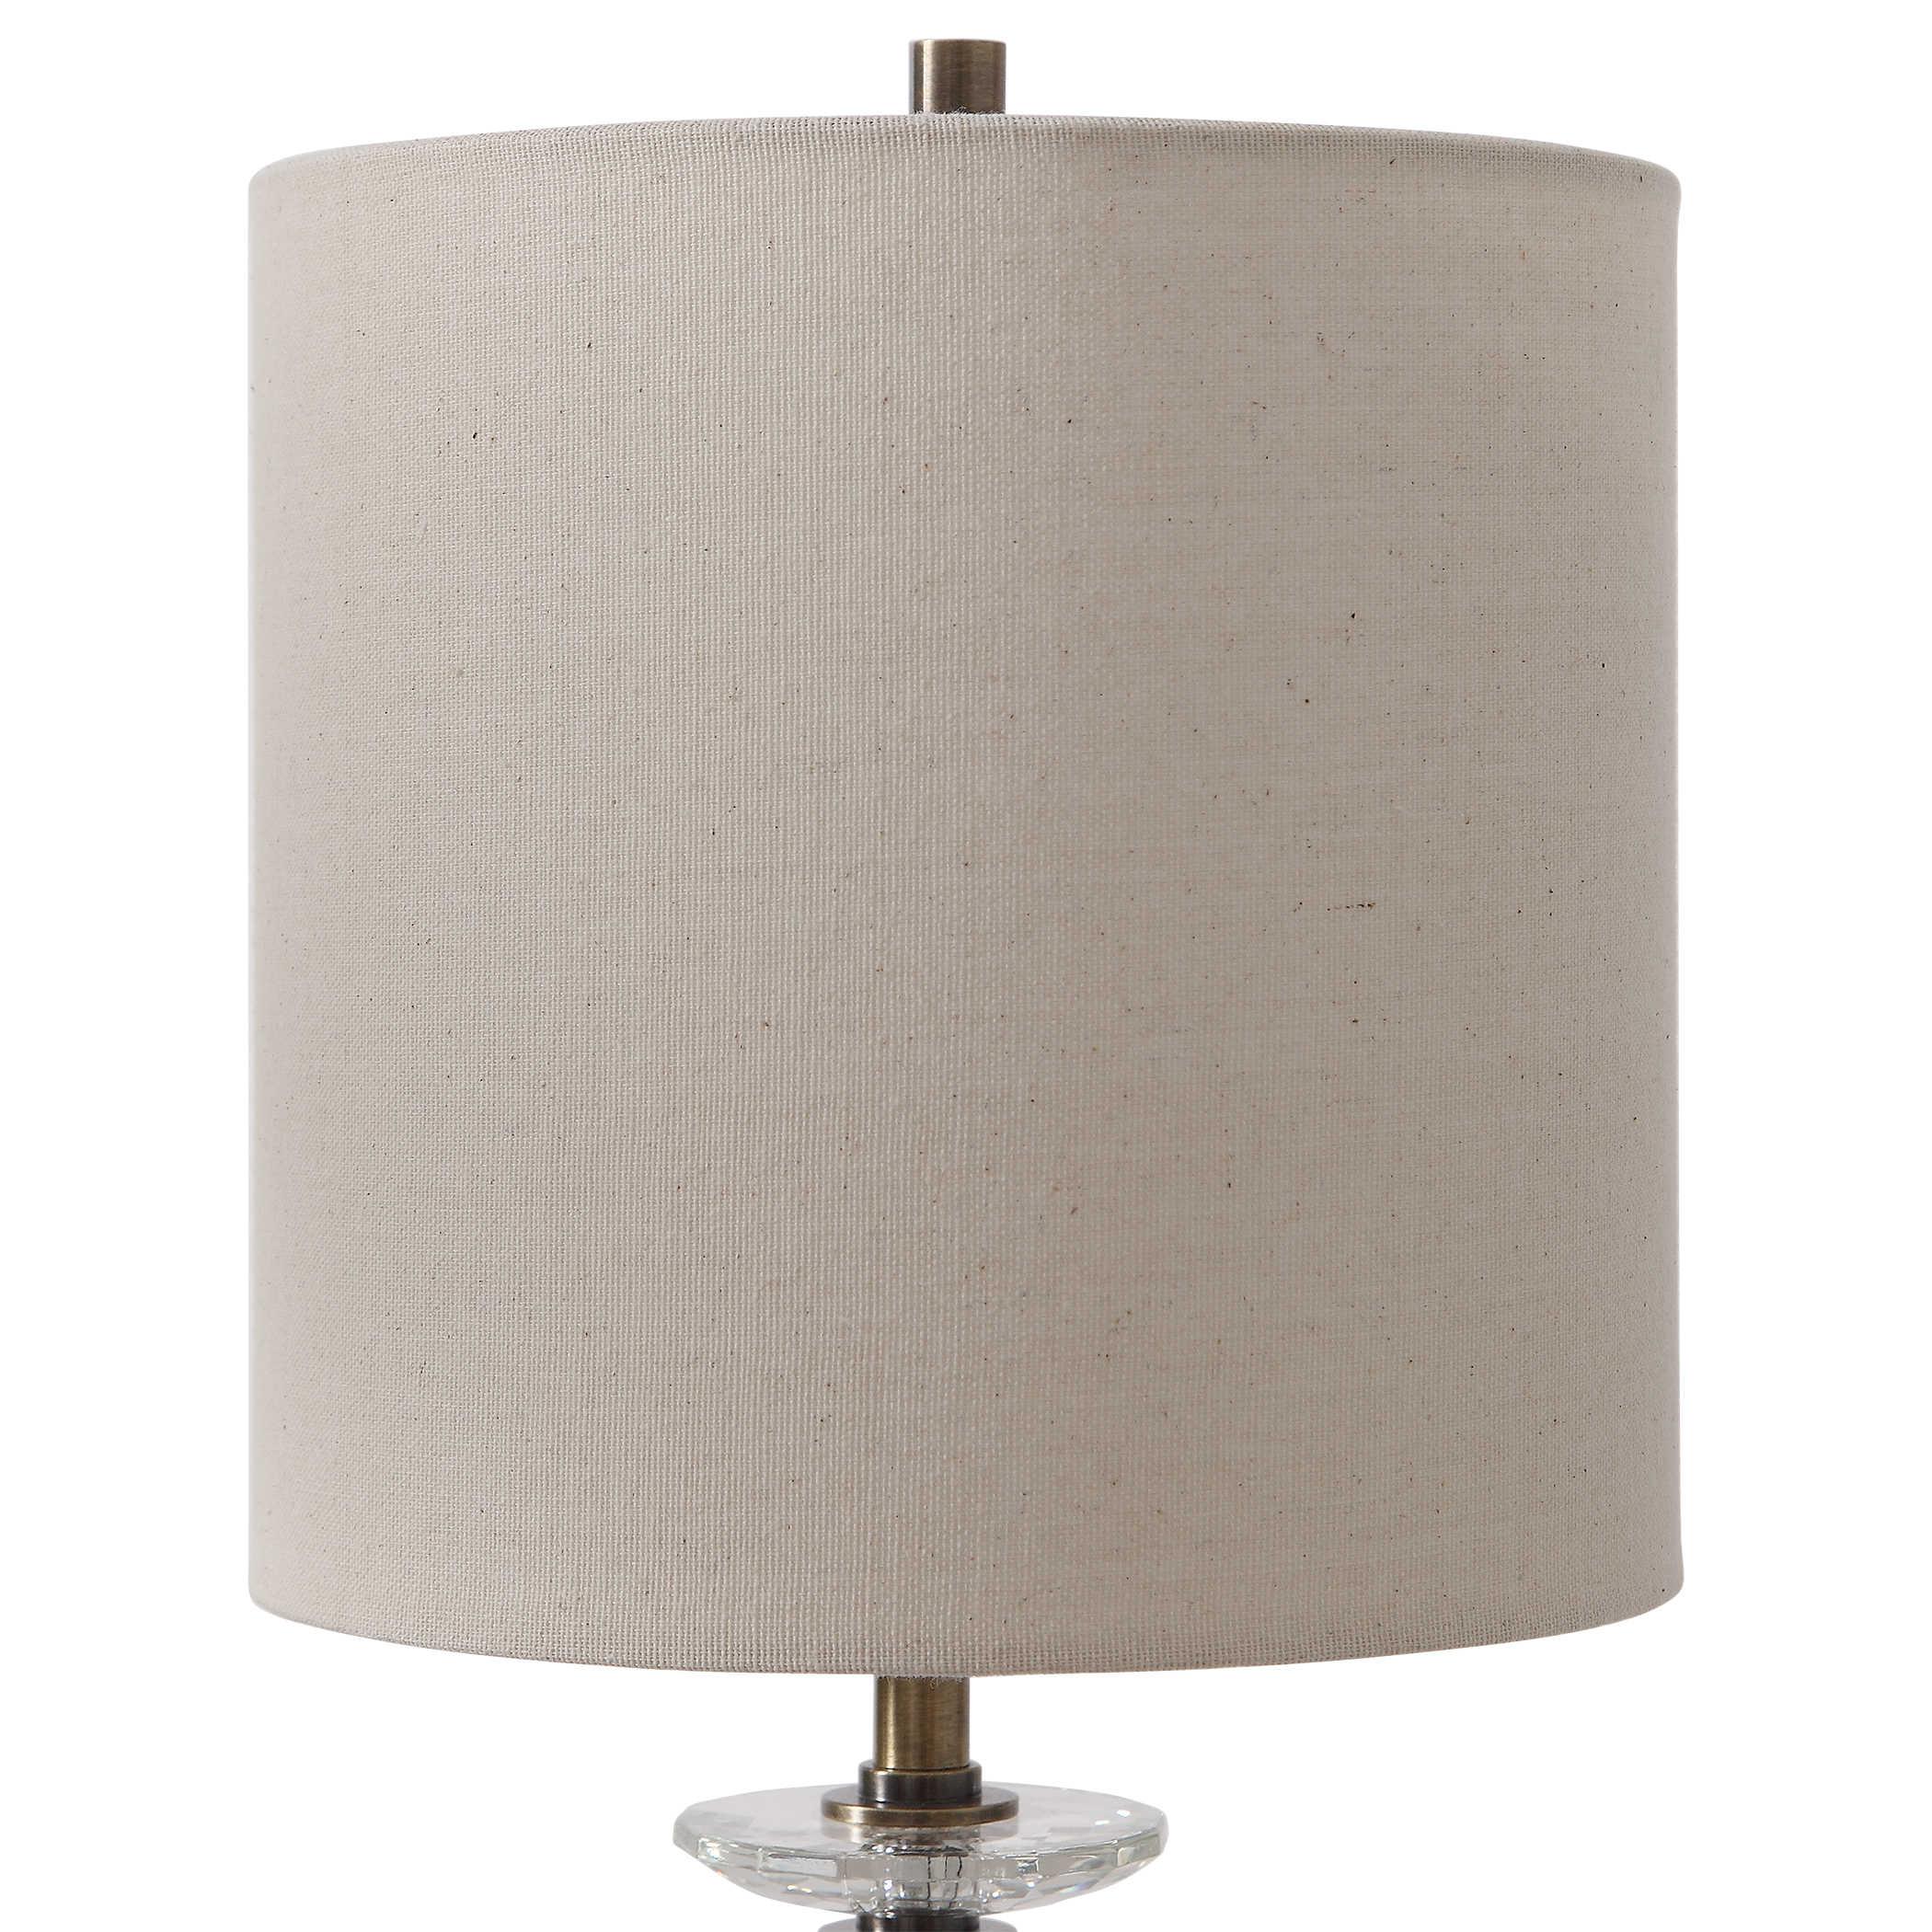 Uttermost Parnell Industrial Buffet Lamp | eBay